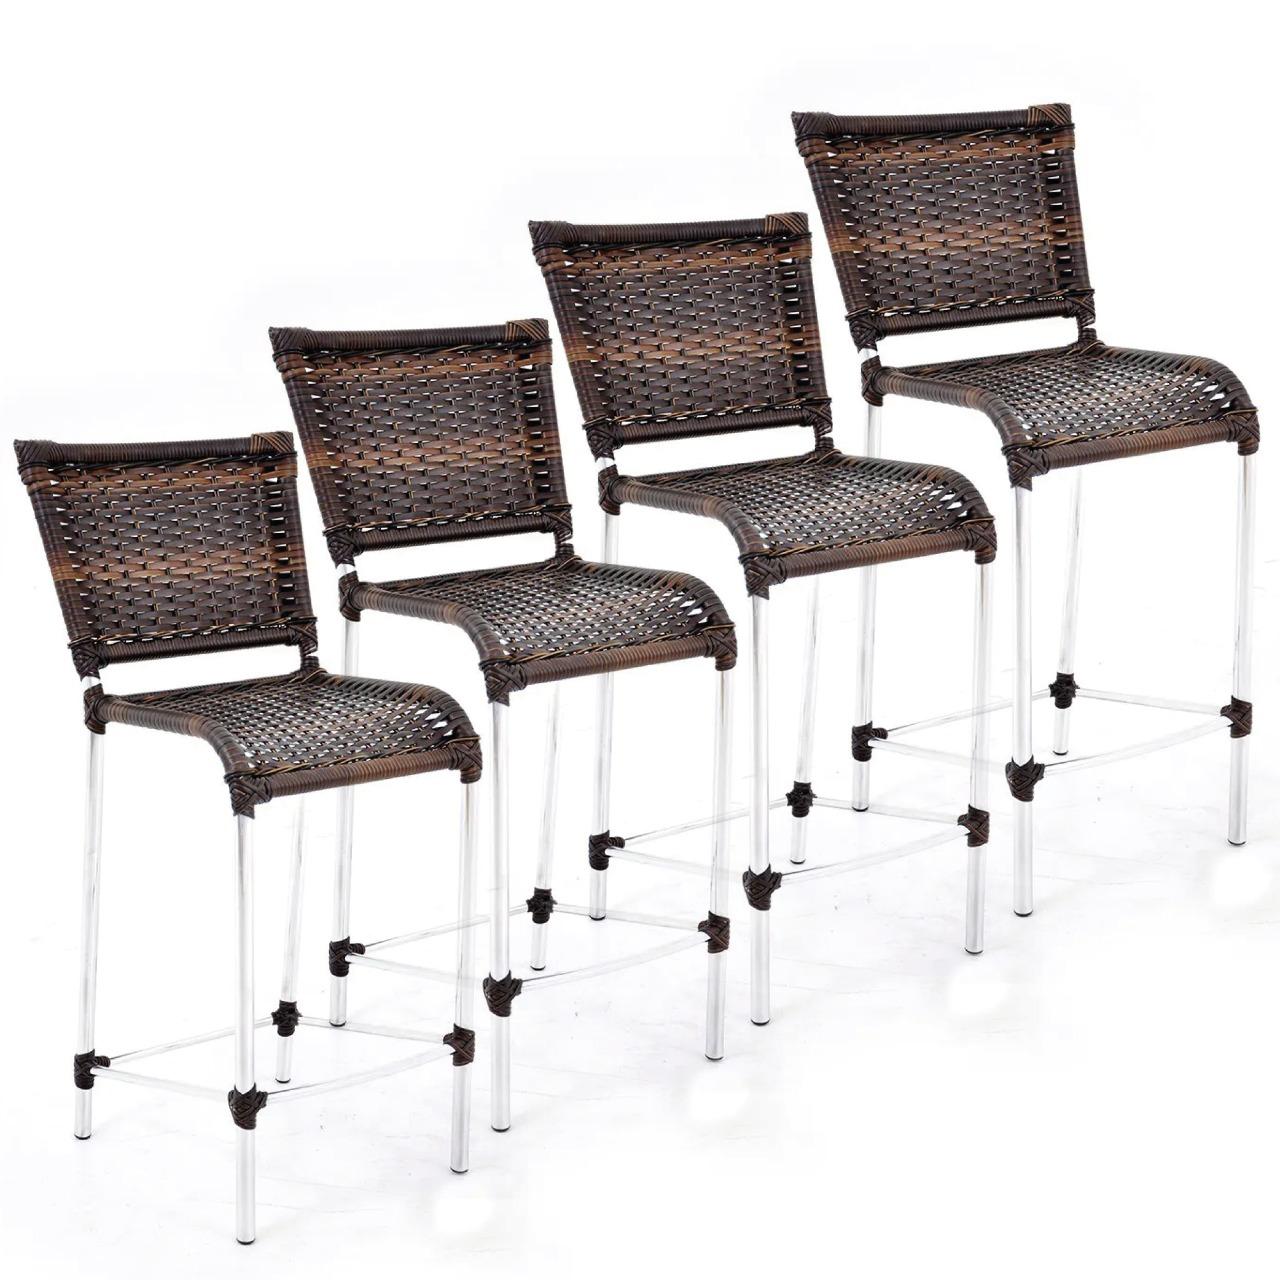 KIT 4 BANQUETAS JAMAICA - cadeira alta - alumínio + fibra junco sintético